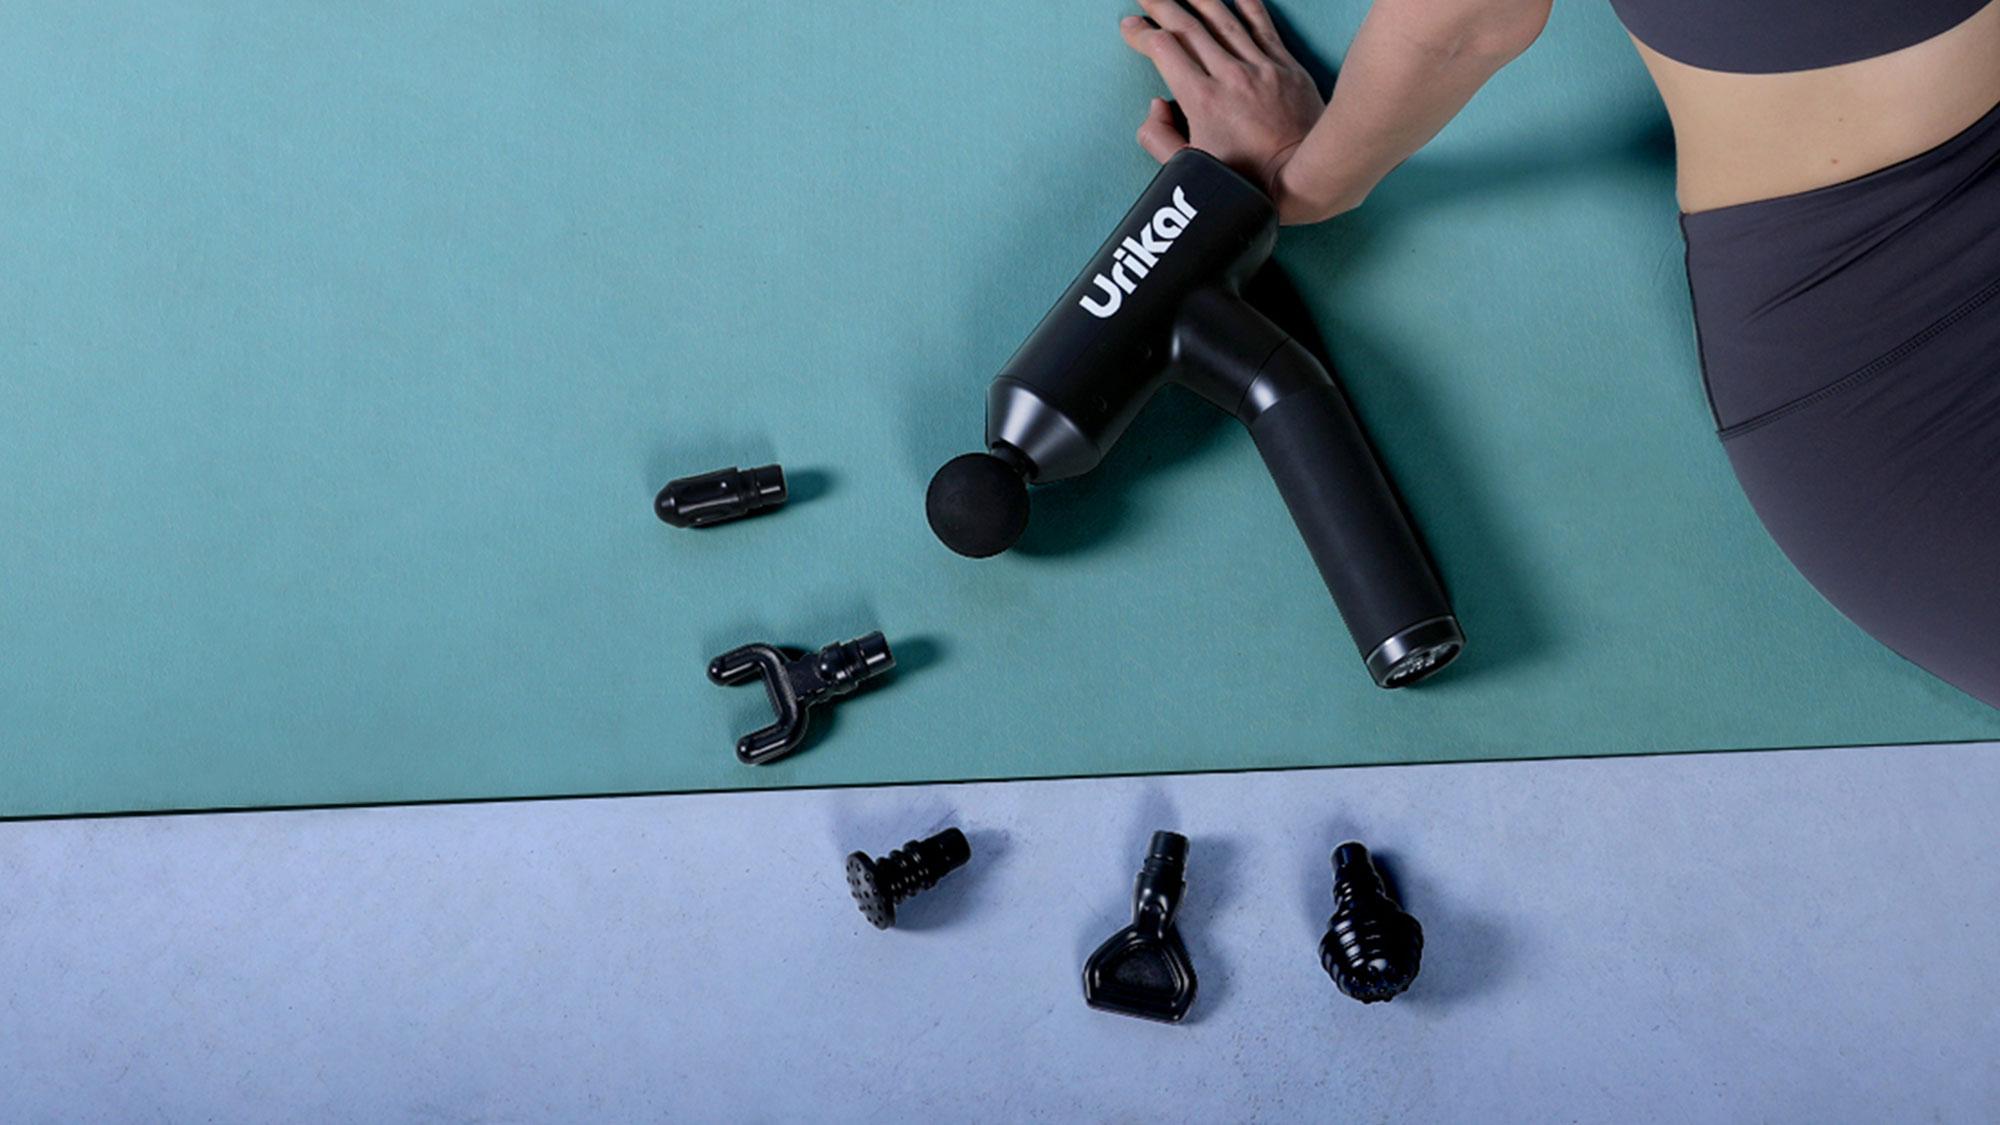 Urikar Pro 3 Massage Gun Launches for US$140